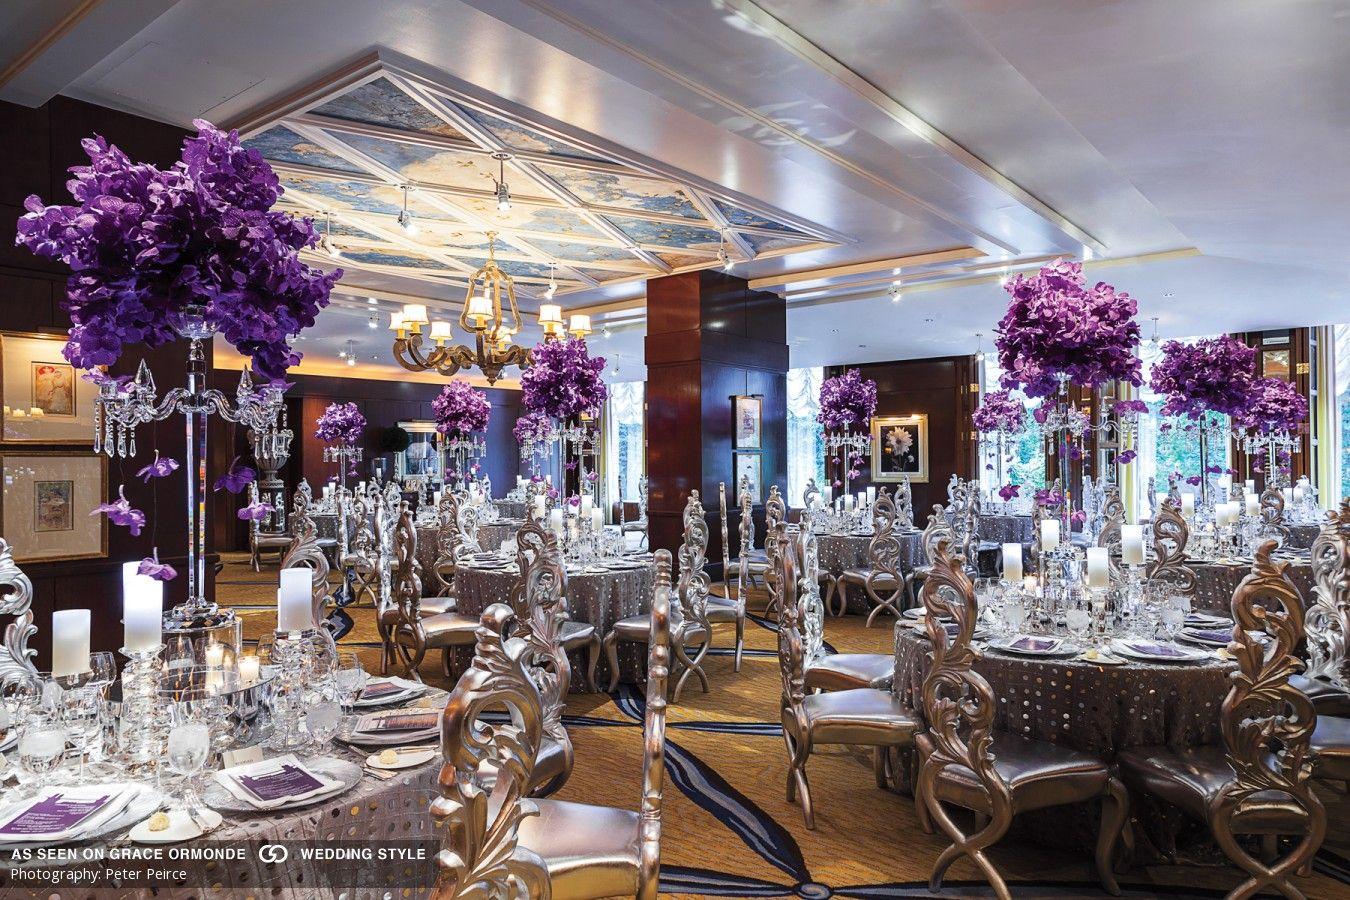 25th wedding decoration ideas  luxurious purple and silver wedding reception table decor idea  My